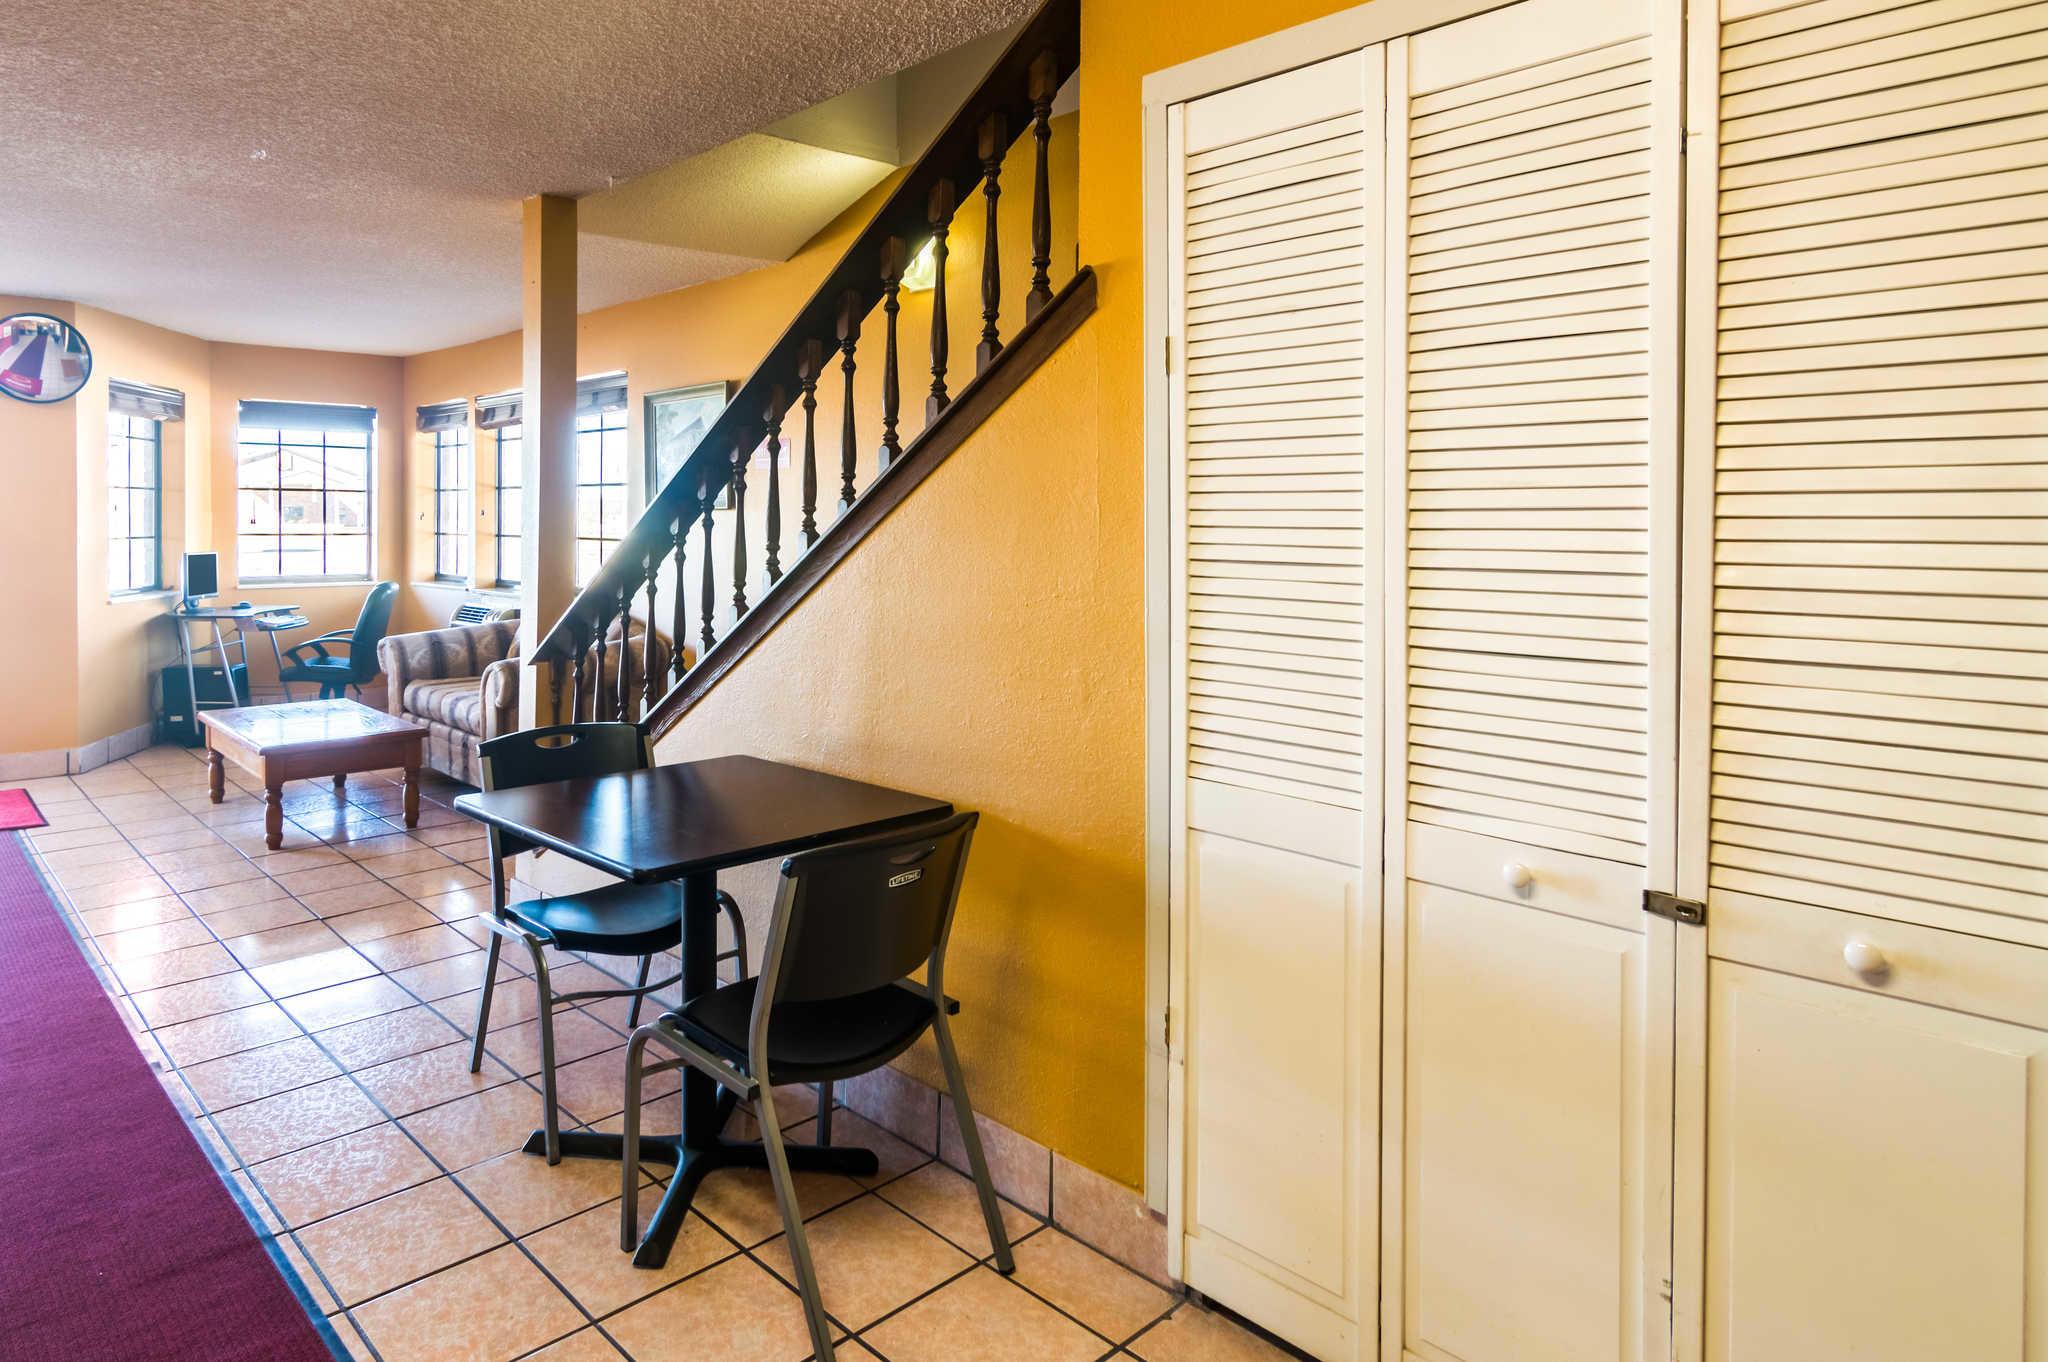 Econo Lodge image 25